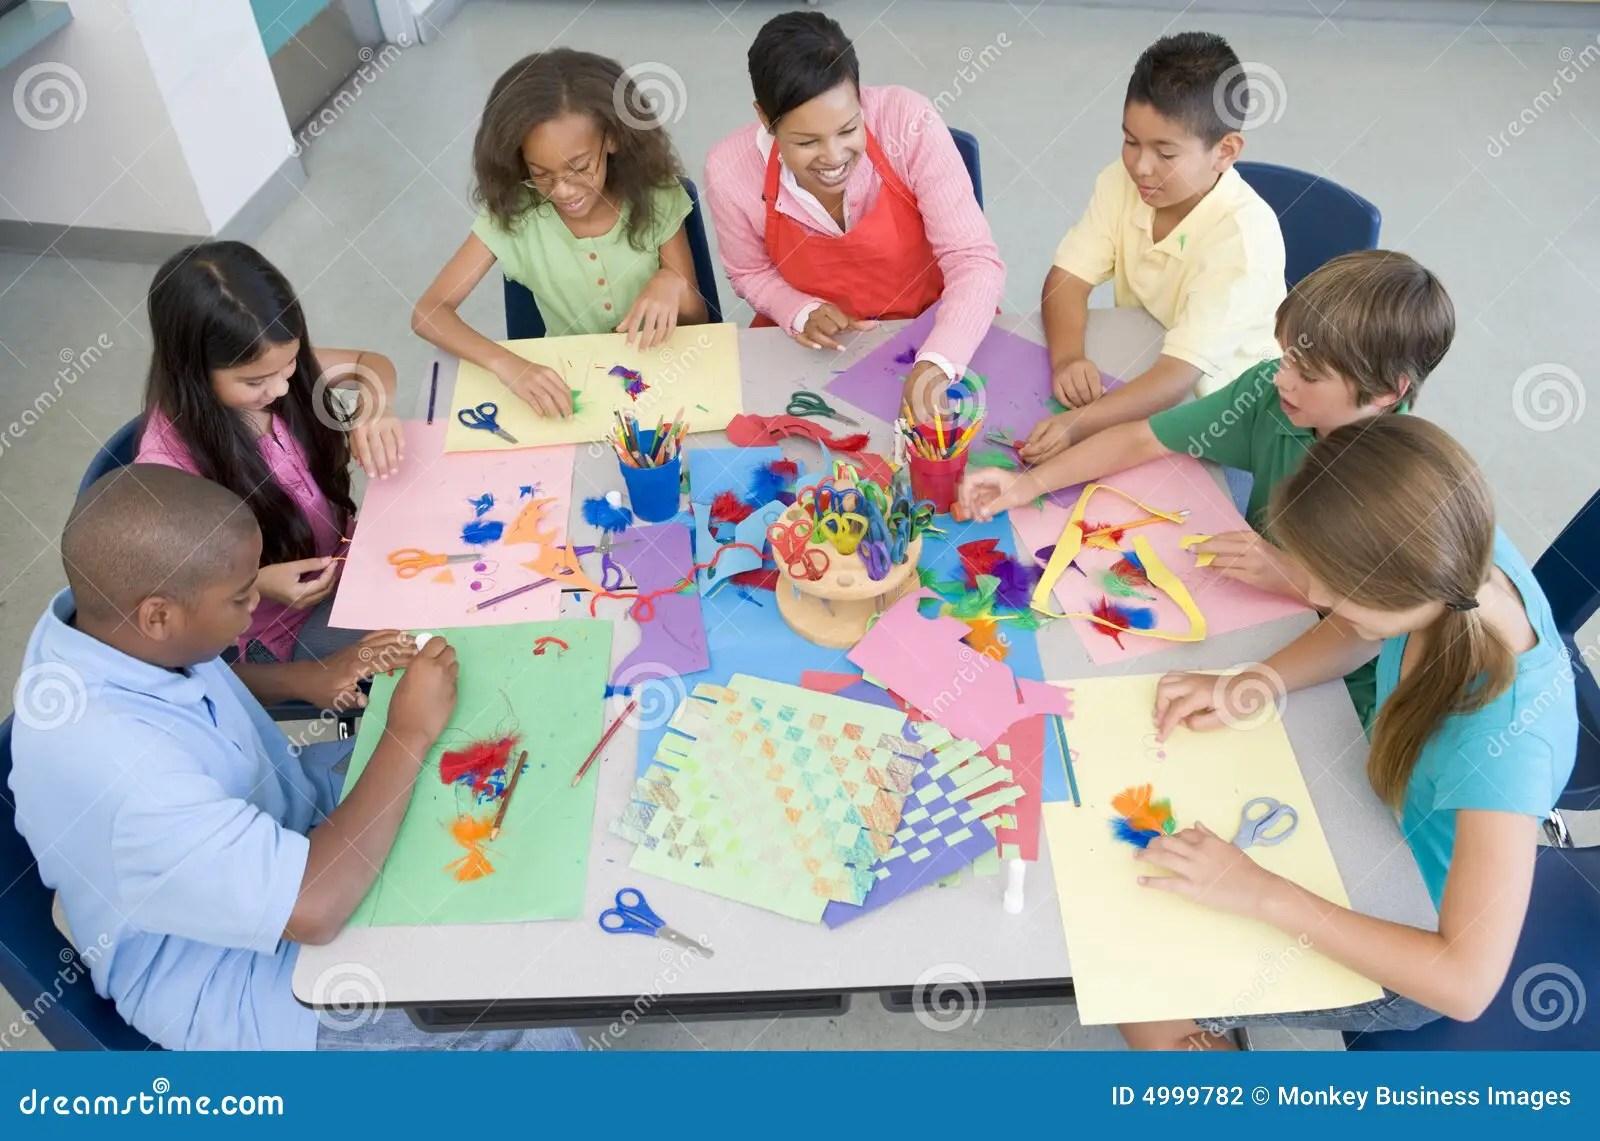 Elementary School Art Lesson Stock Photography